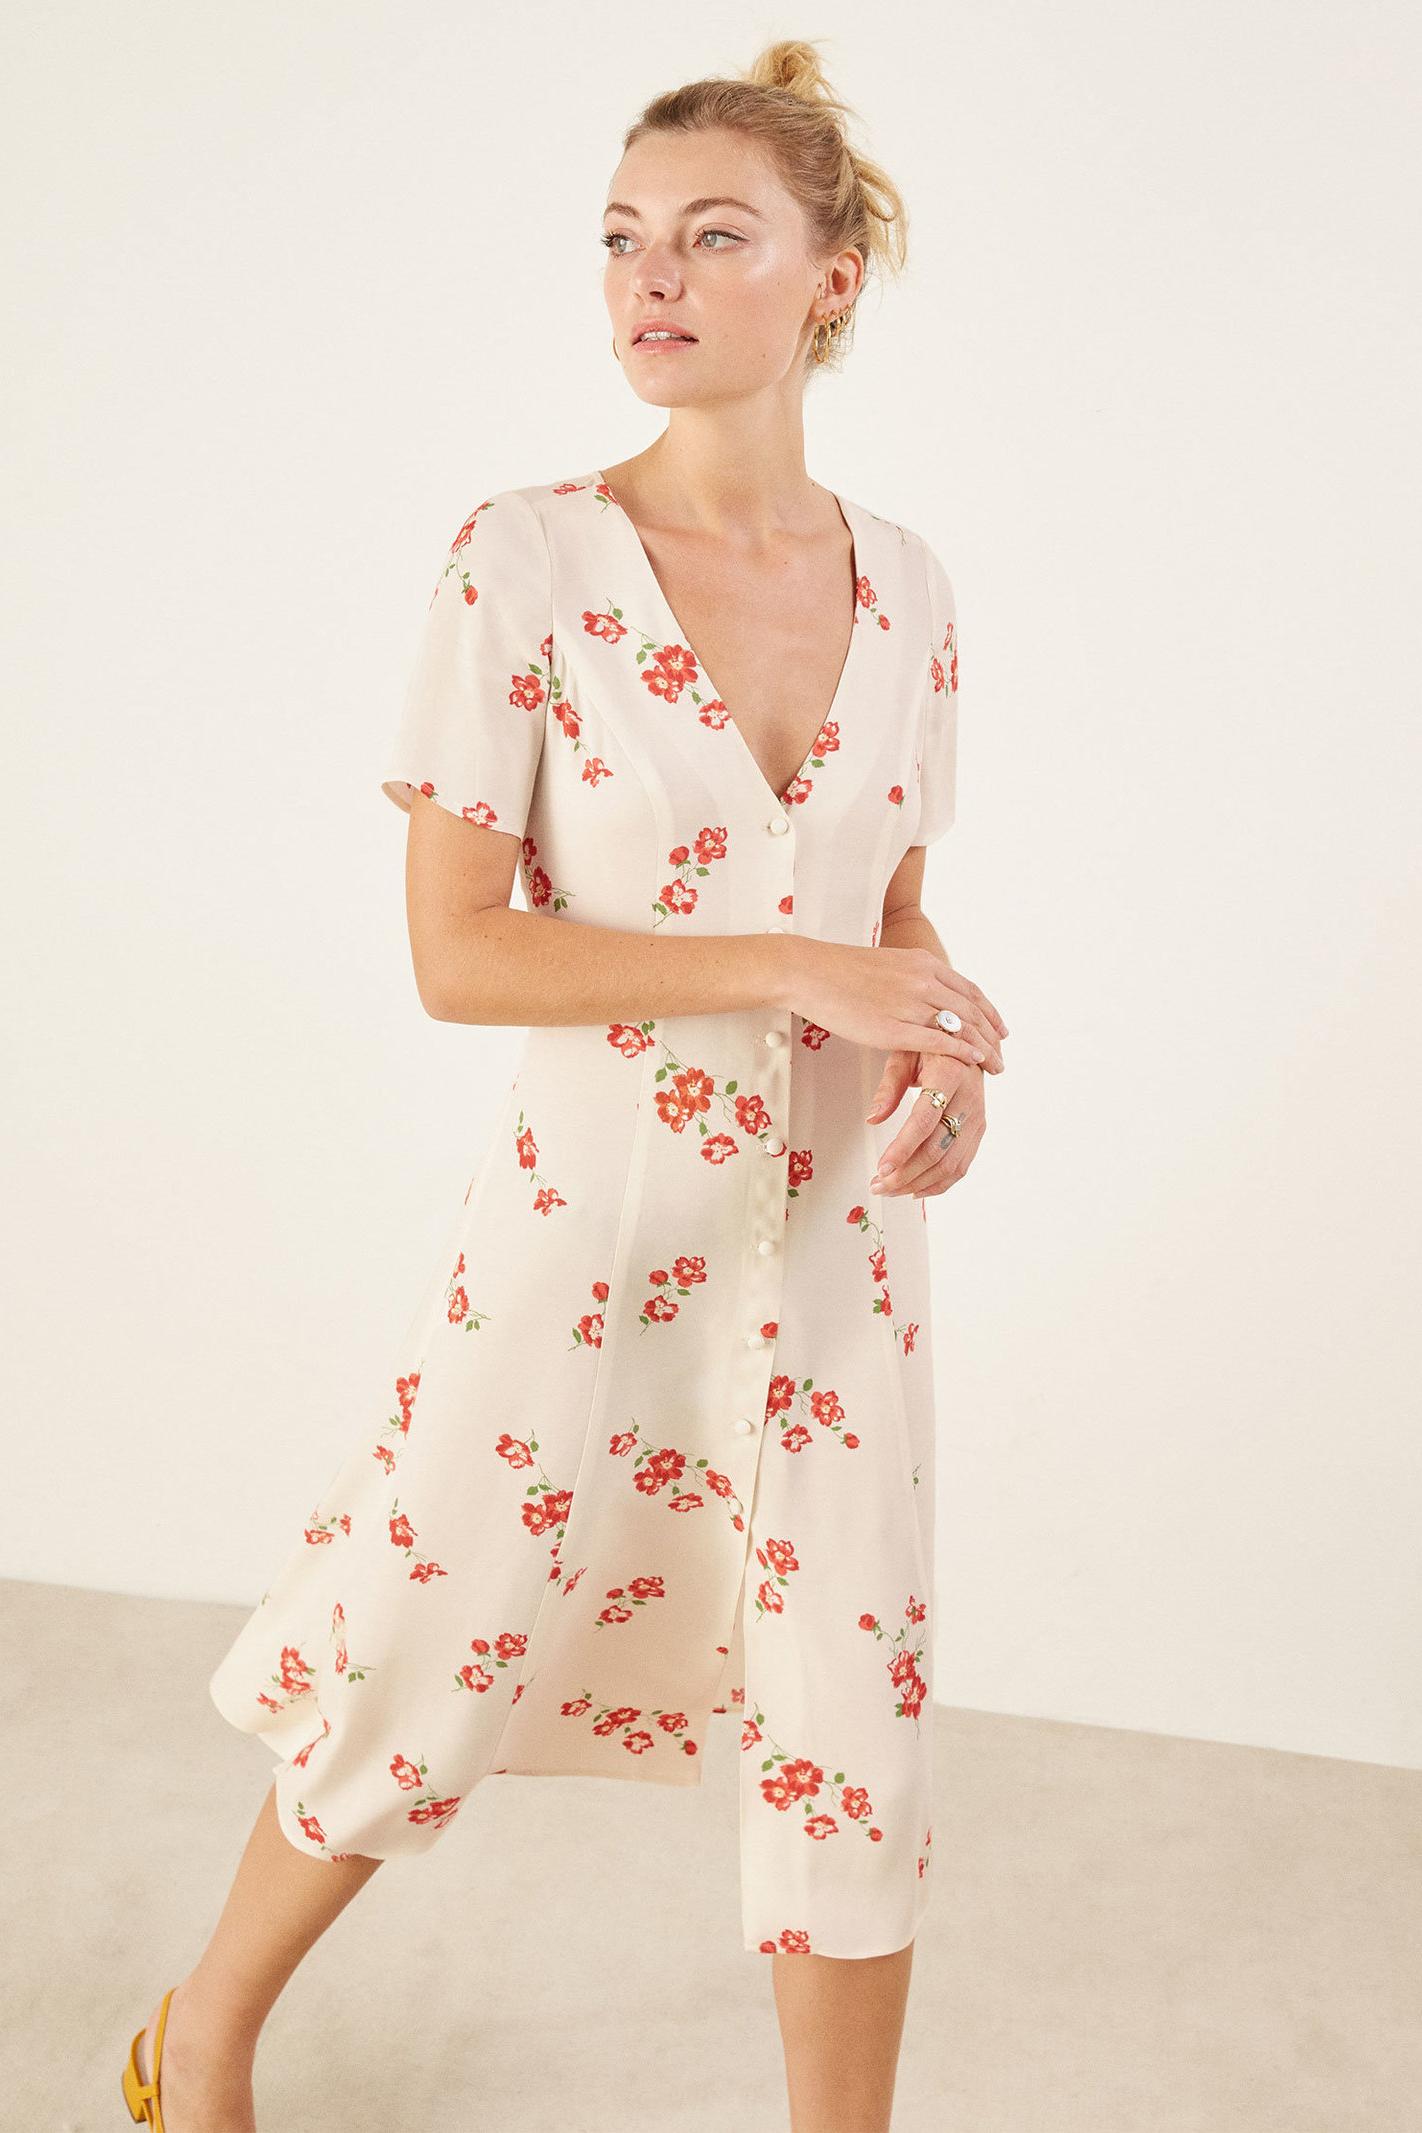 2018_05_14_AM_LOCKLIN_DRESS.MAGDALENA_082